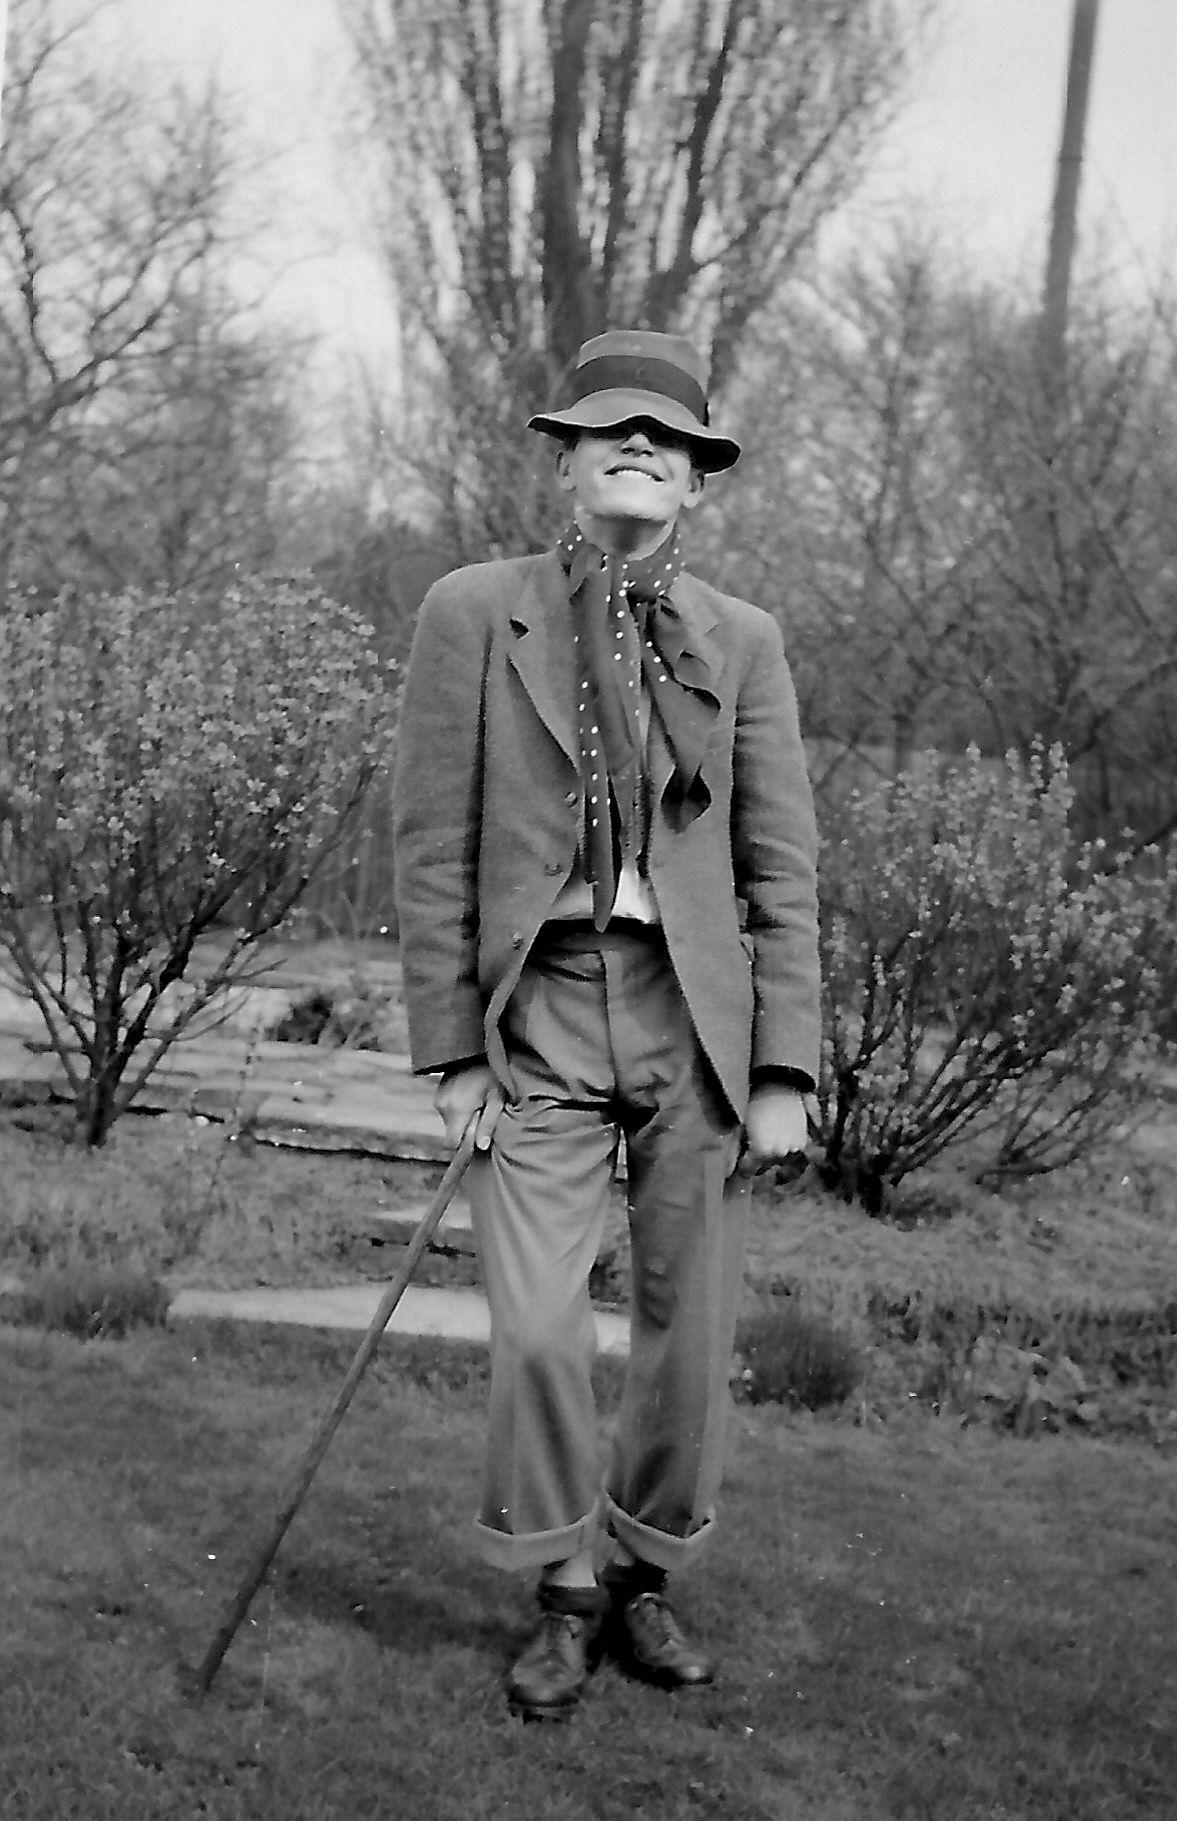 Vintage Photos ~ The Sartorialist ~ 1940's or 1950's ...